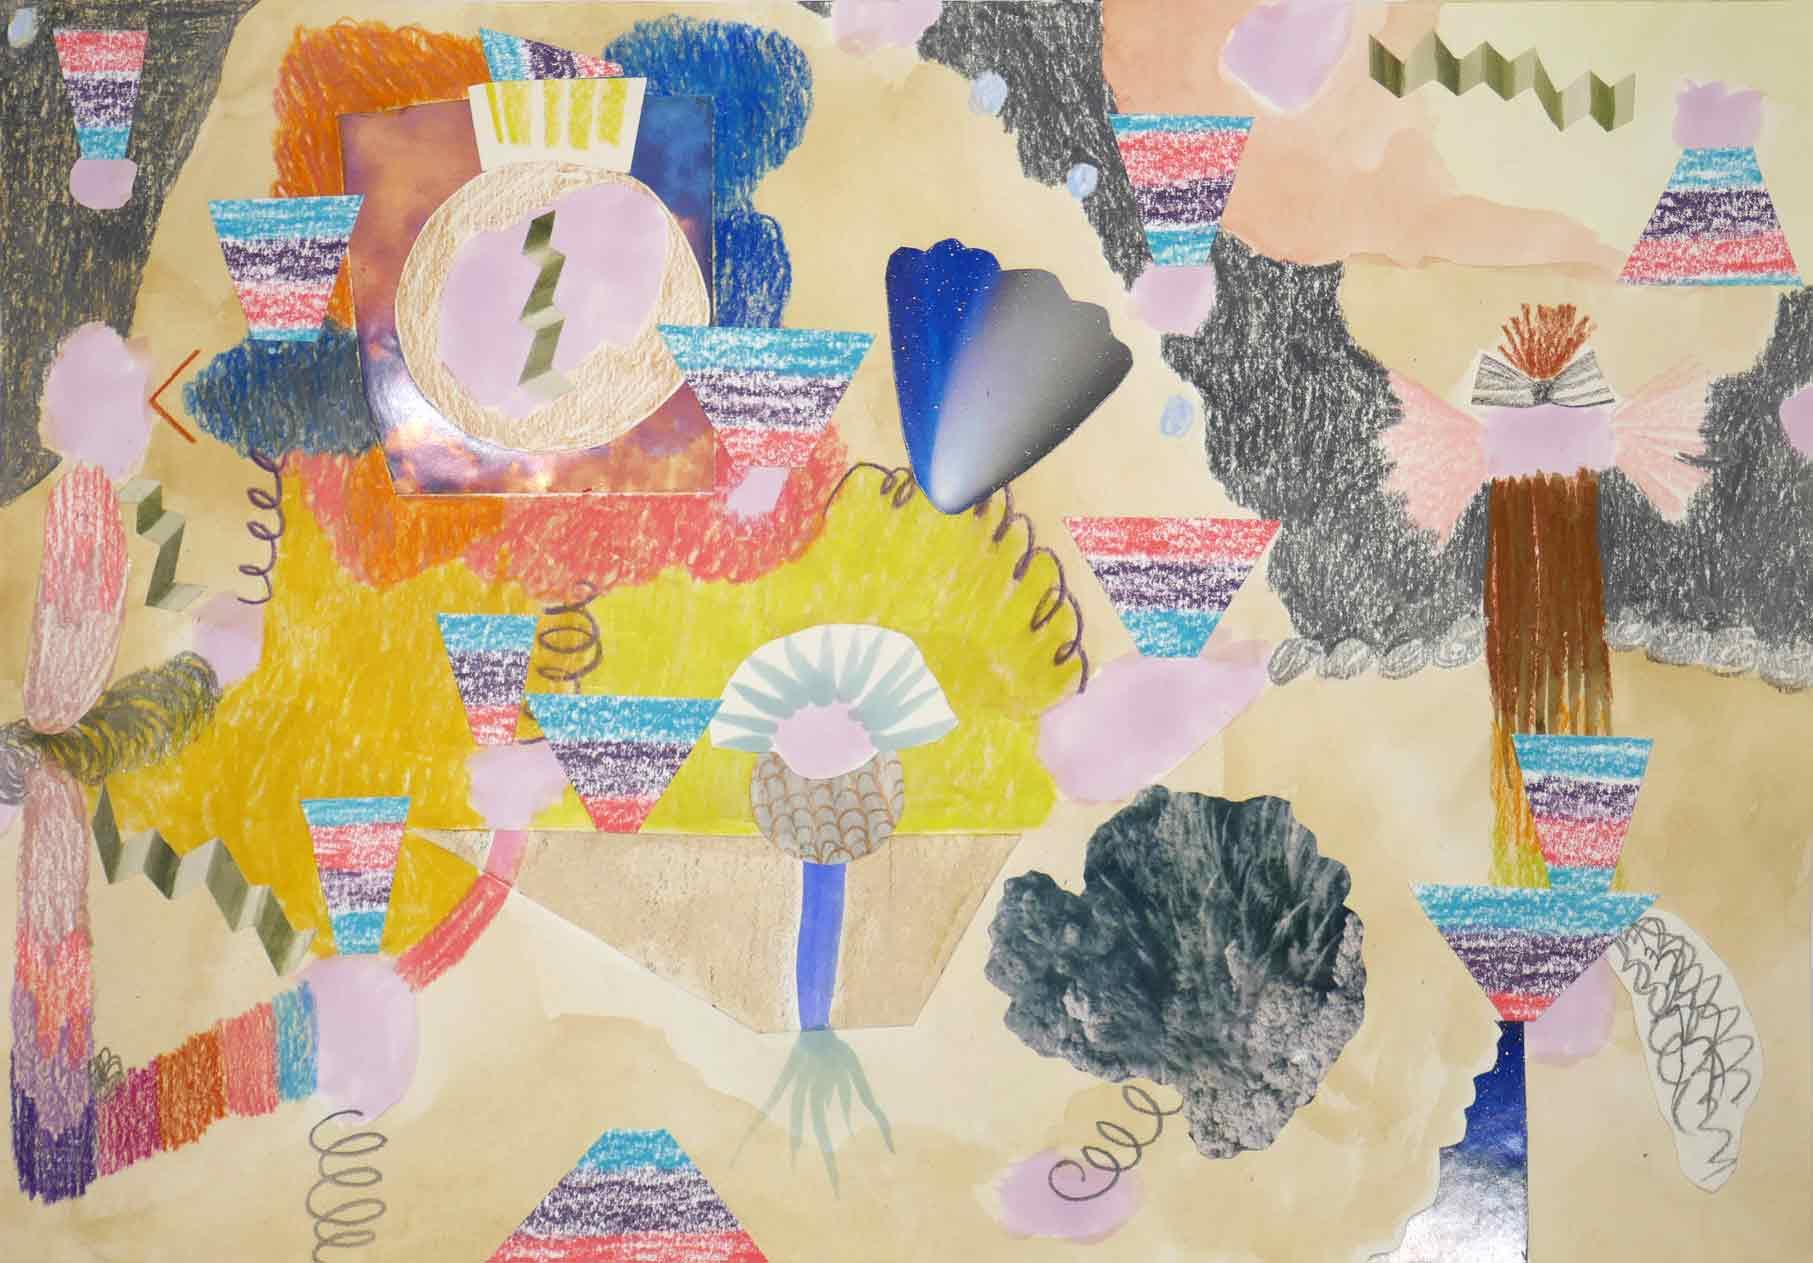 Uit de serie  Endings and beginnings  collage; inkt, foto's, potlood, aquarel 22 x 33 cm, 2018